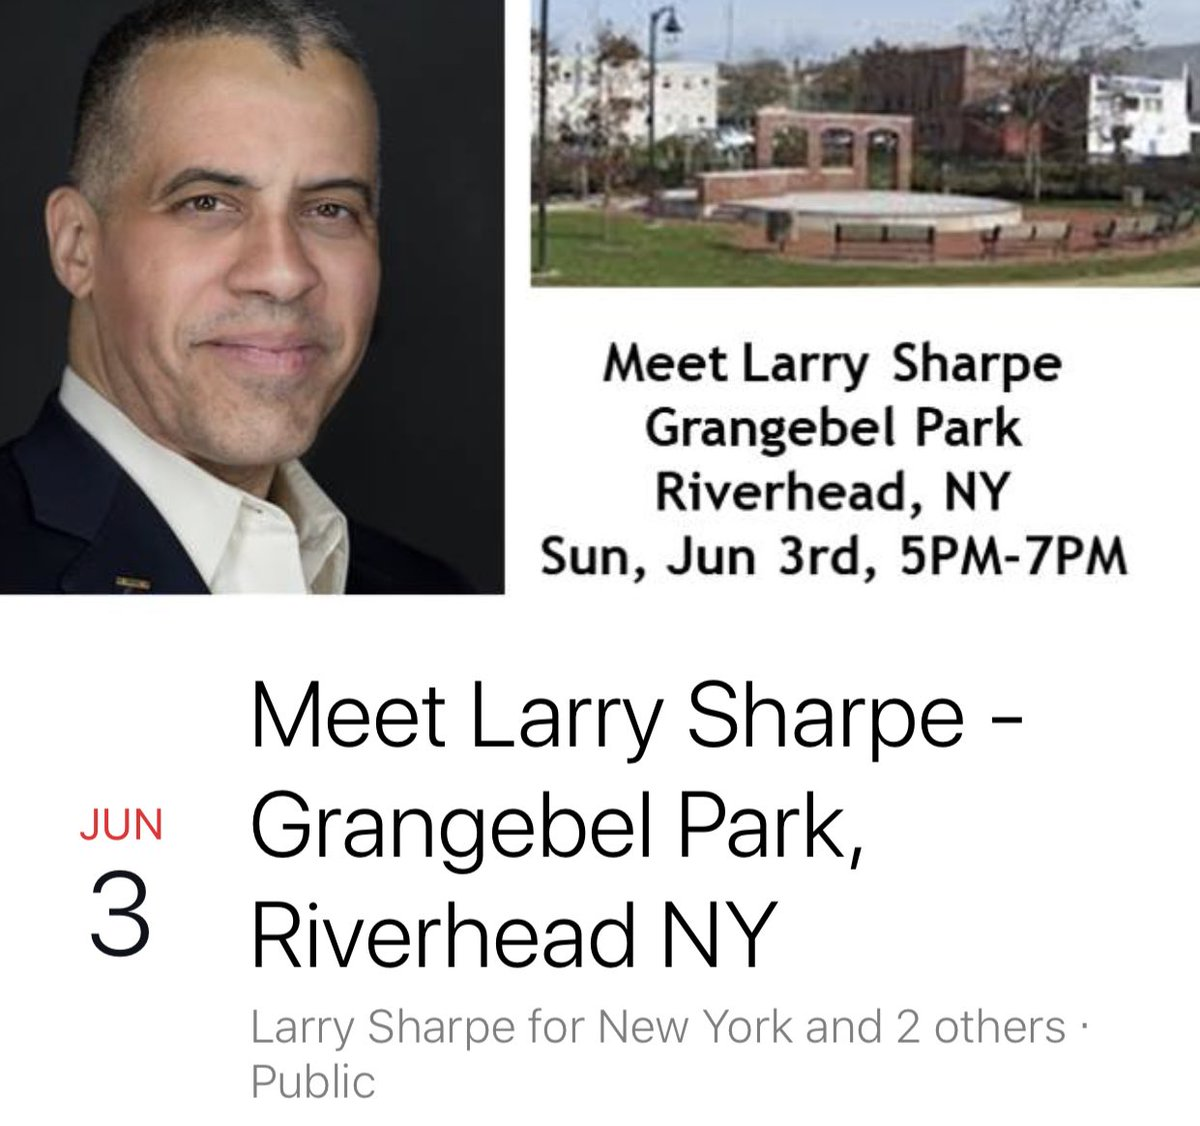 Larry Sharpe On Twitter Im Having A Meet And Greet Tomorrow June